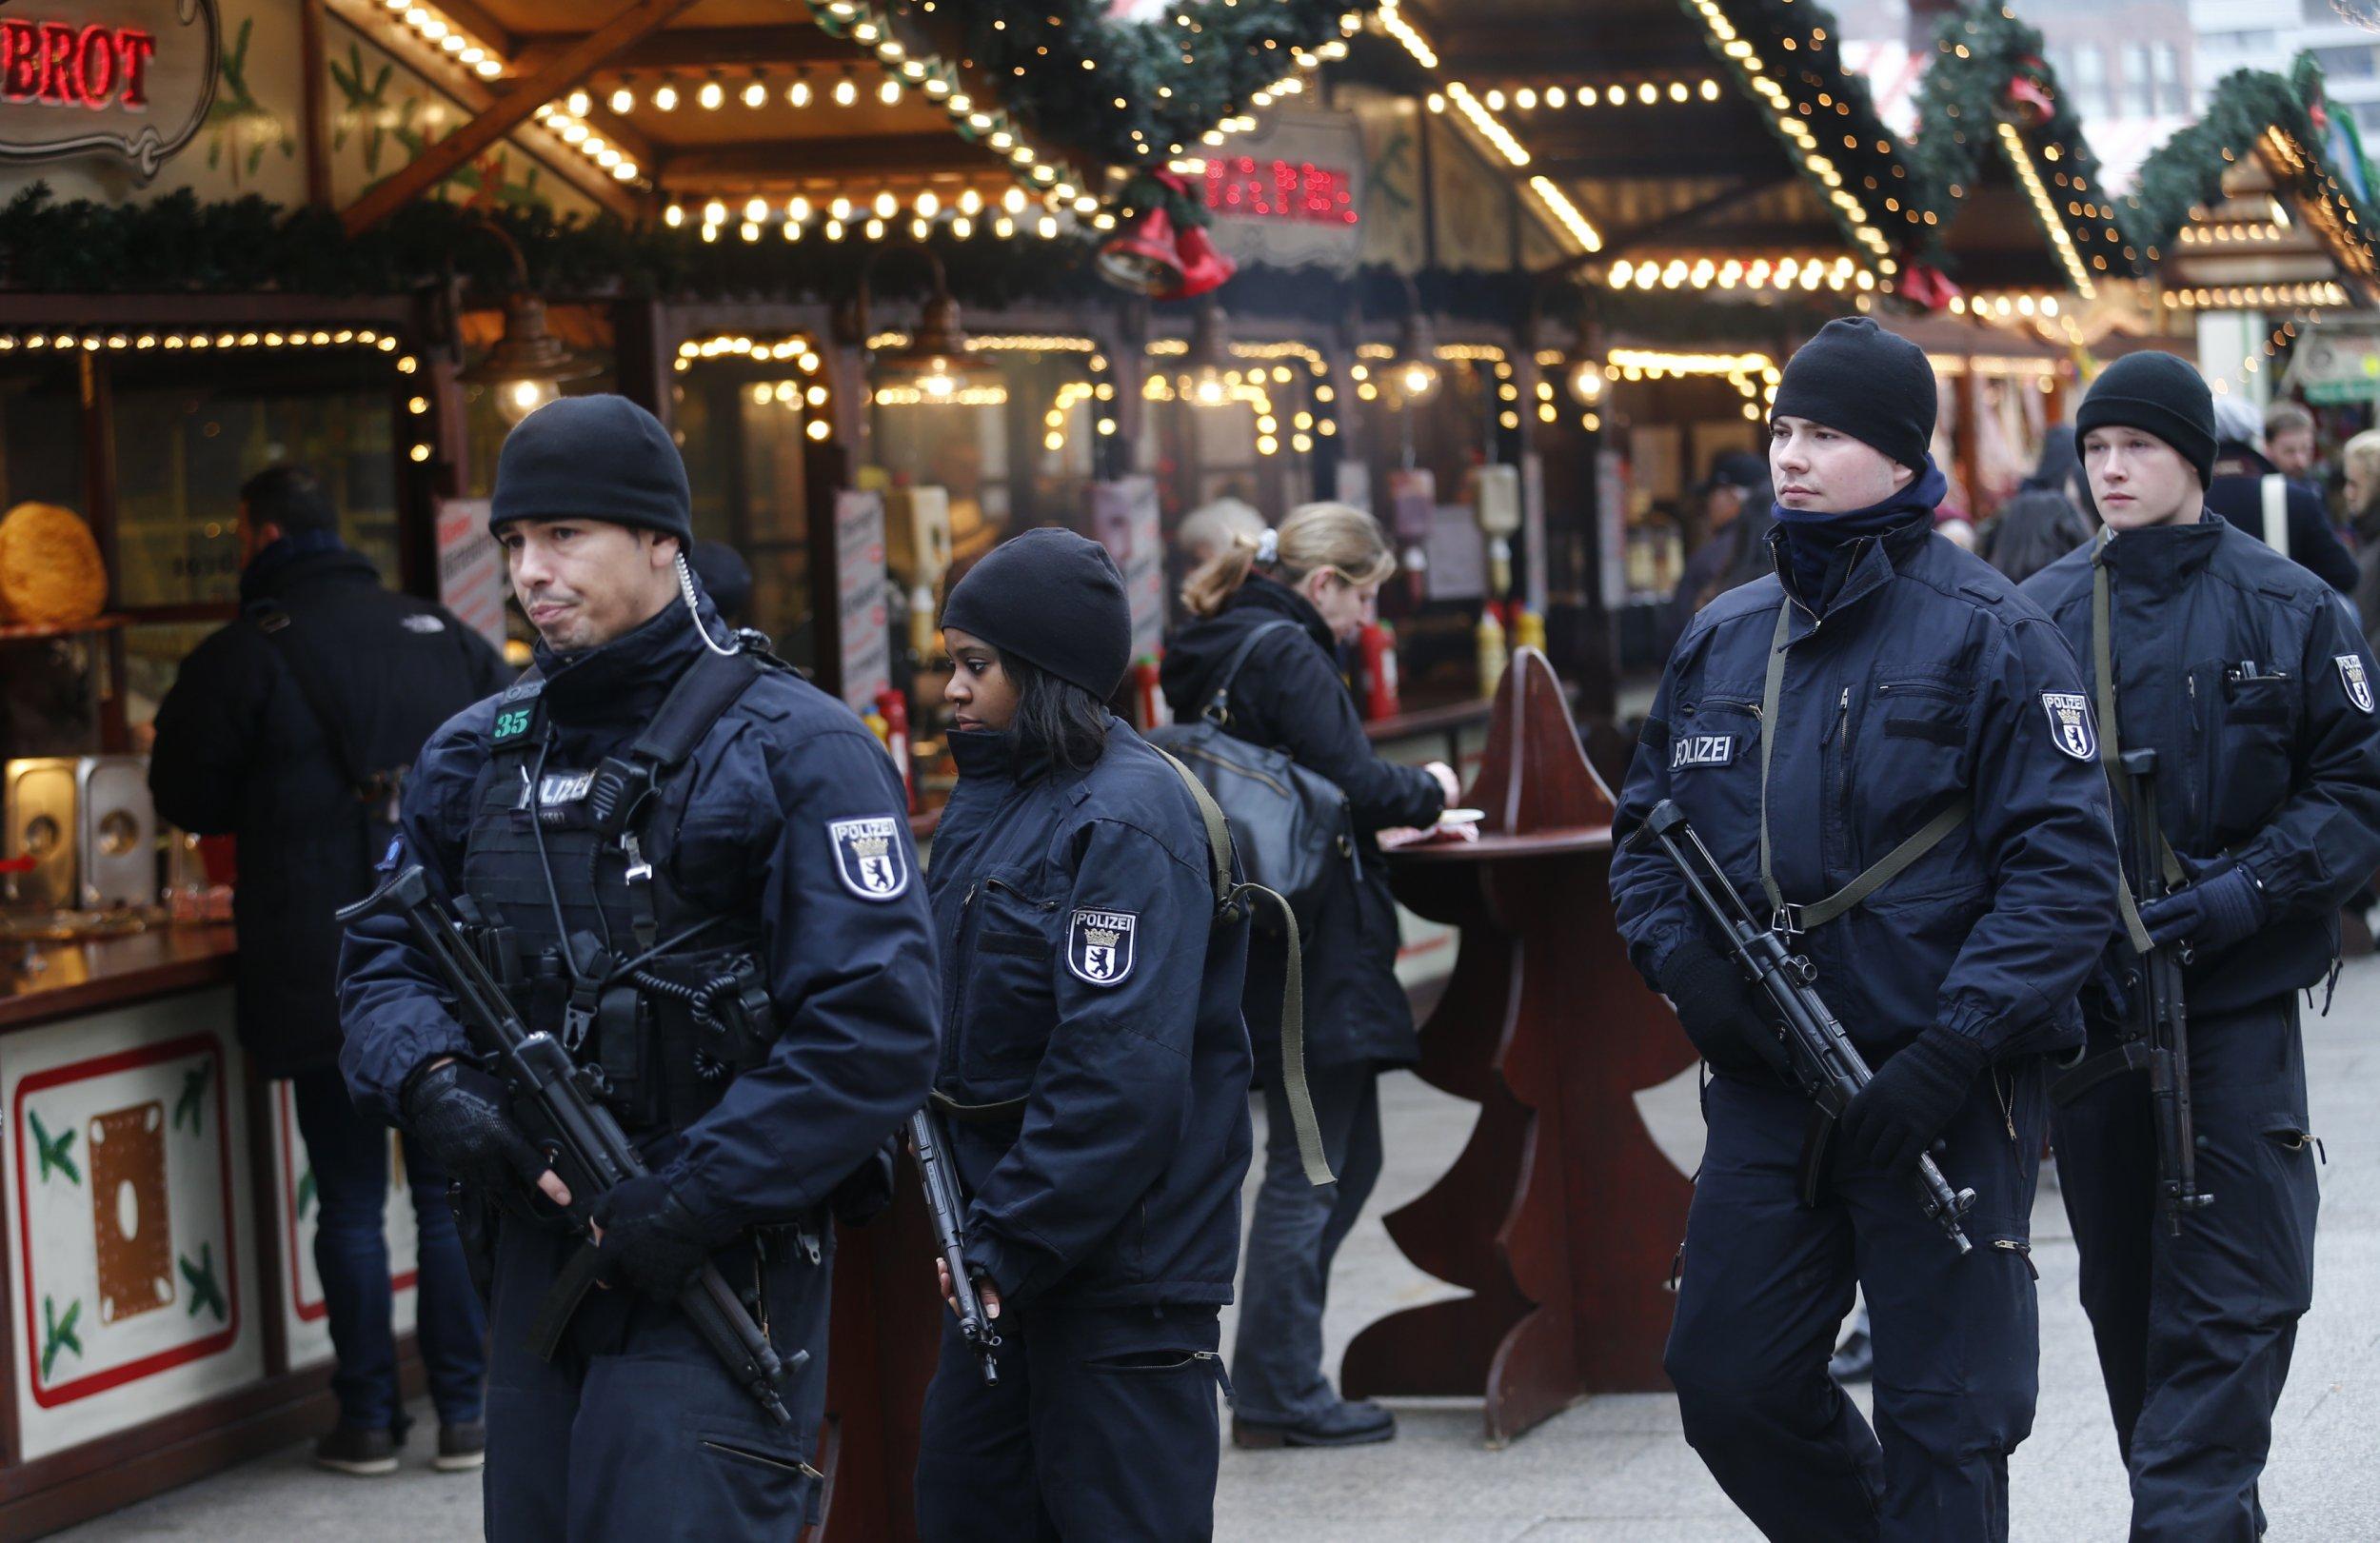 Berlin Christmas Market Attack Police